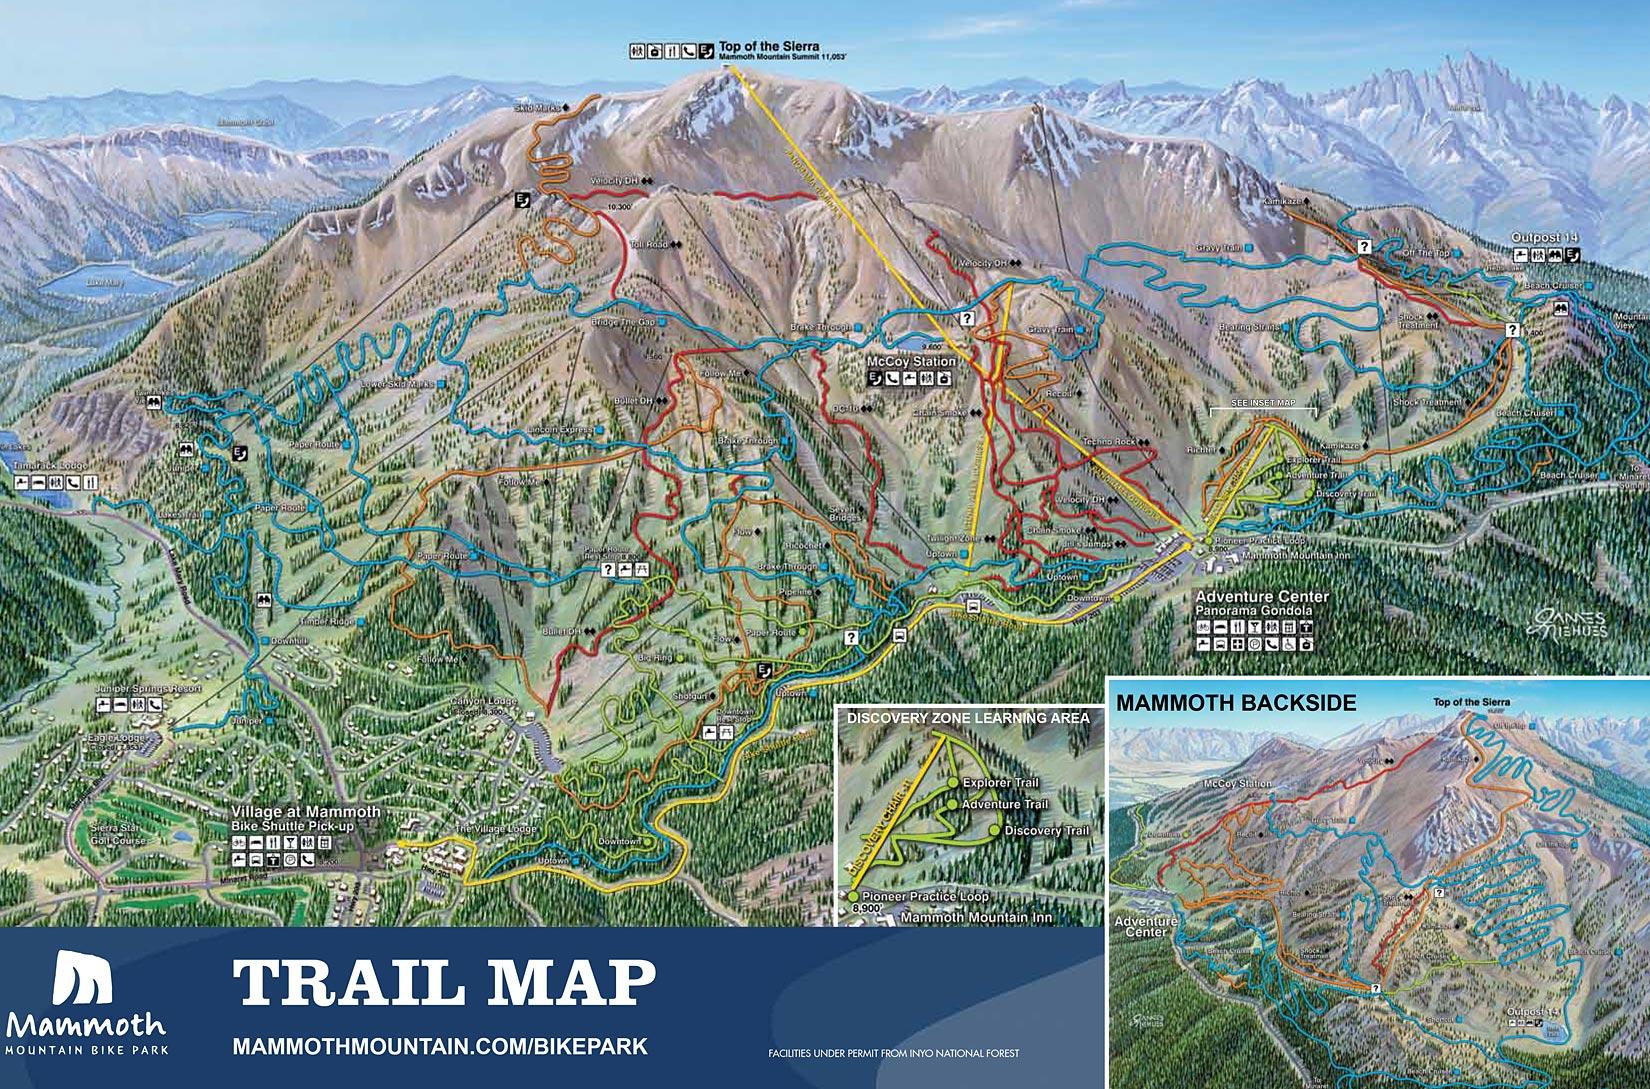 Mammoth Mountain Map California - Klipy - Mammoth Mountain Map California